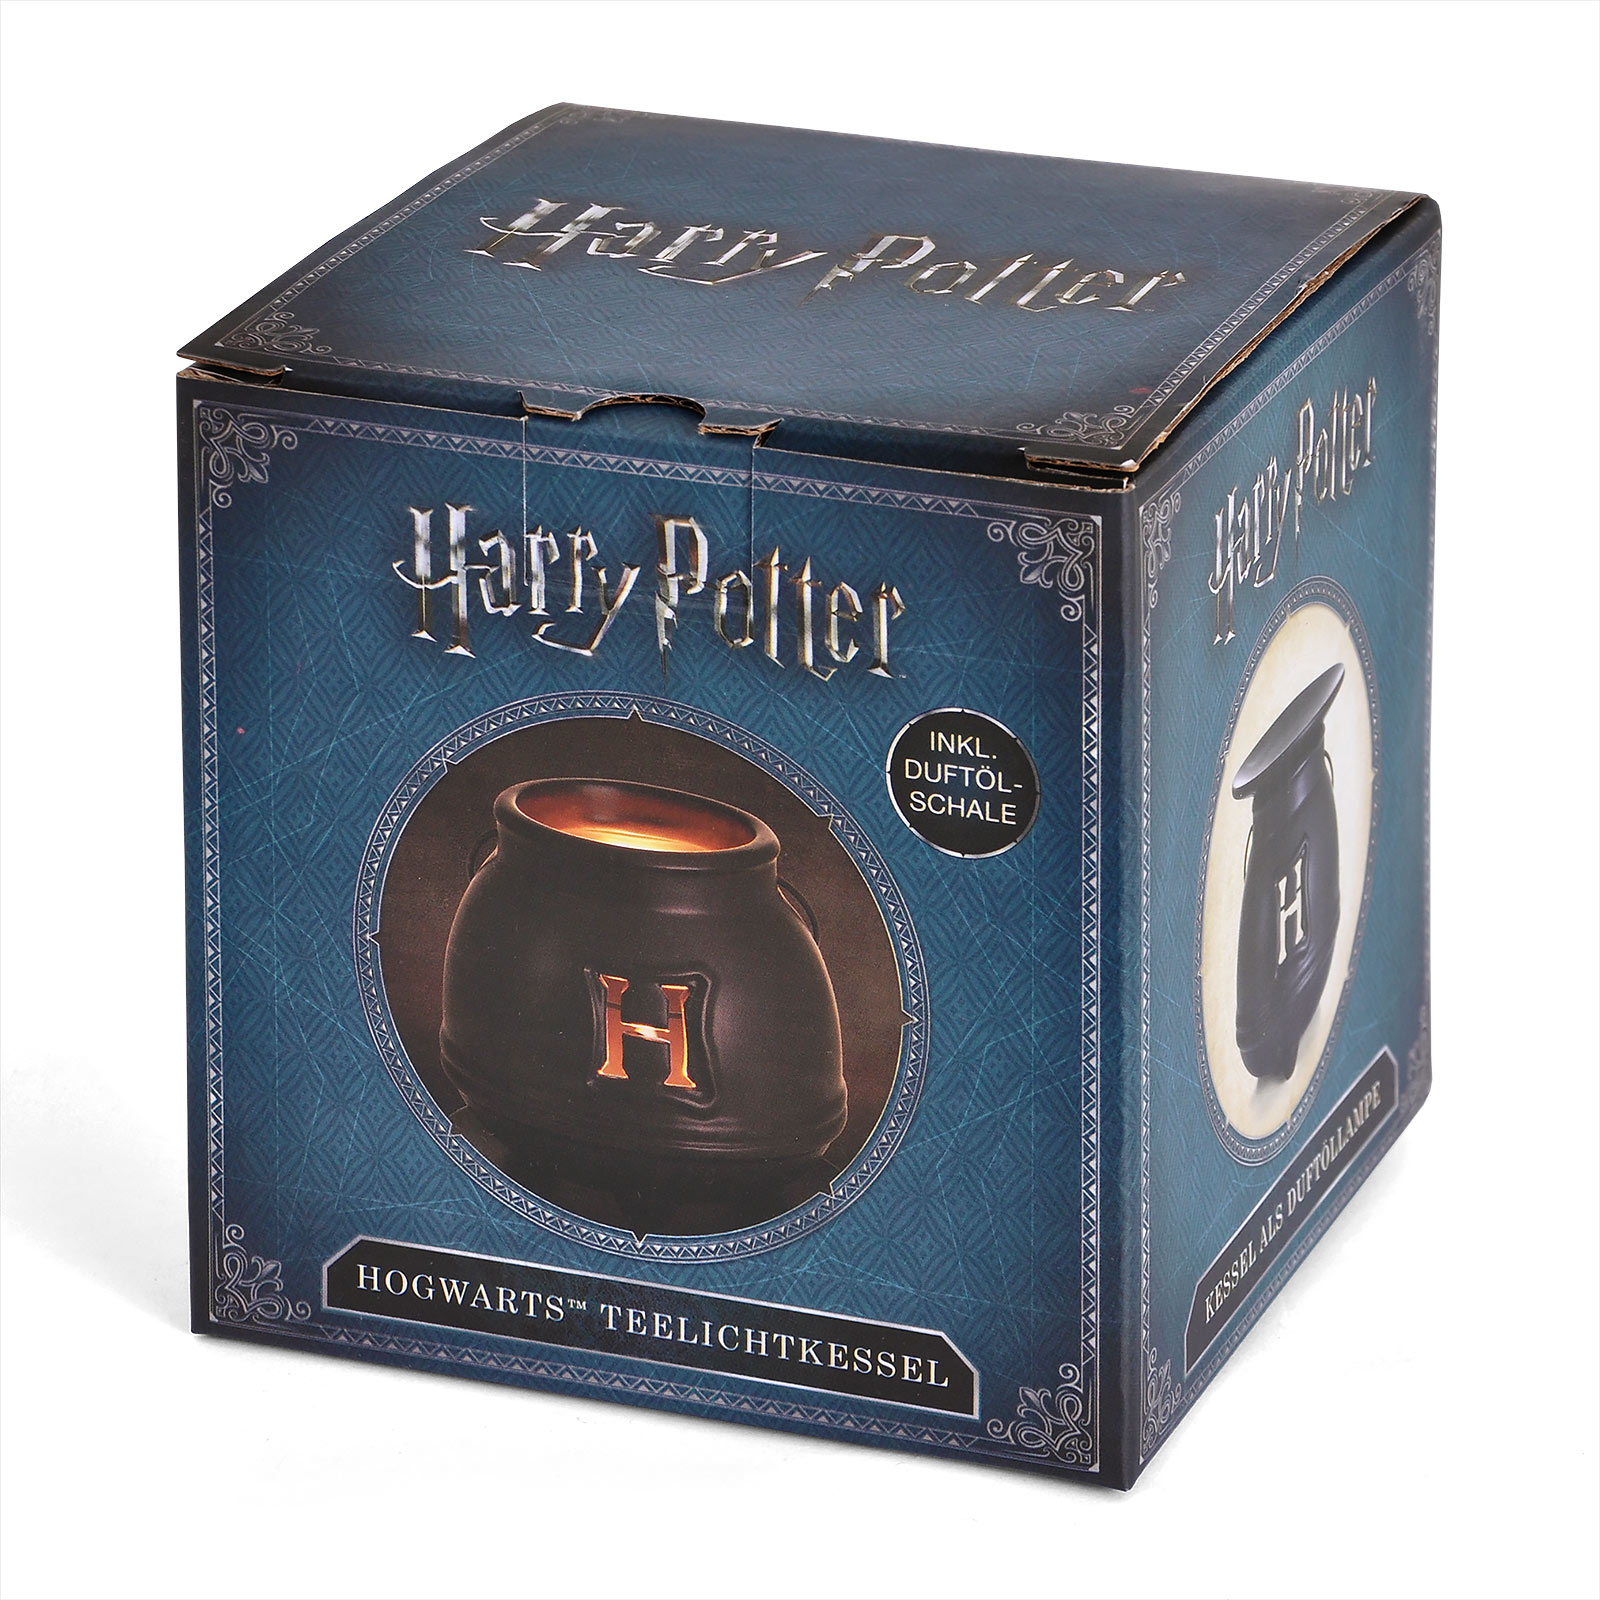 Harry Potter - Hogwarts Teelichtkessel